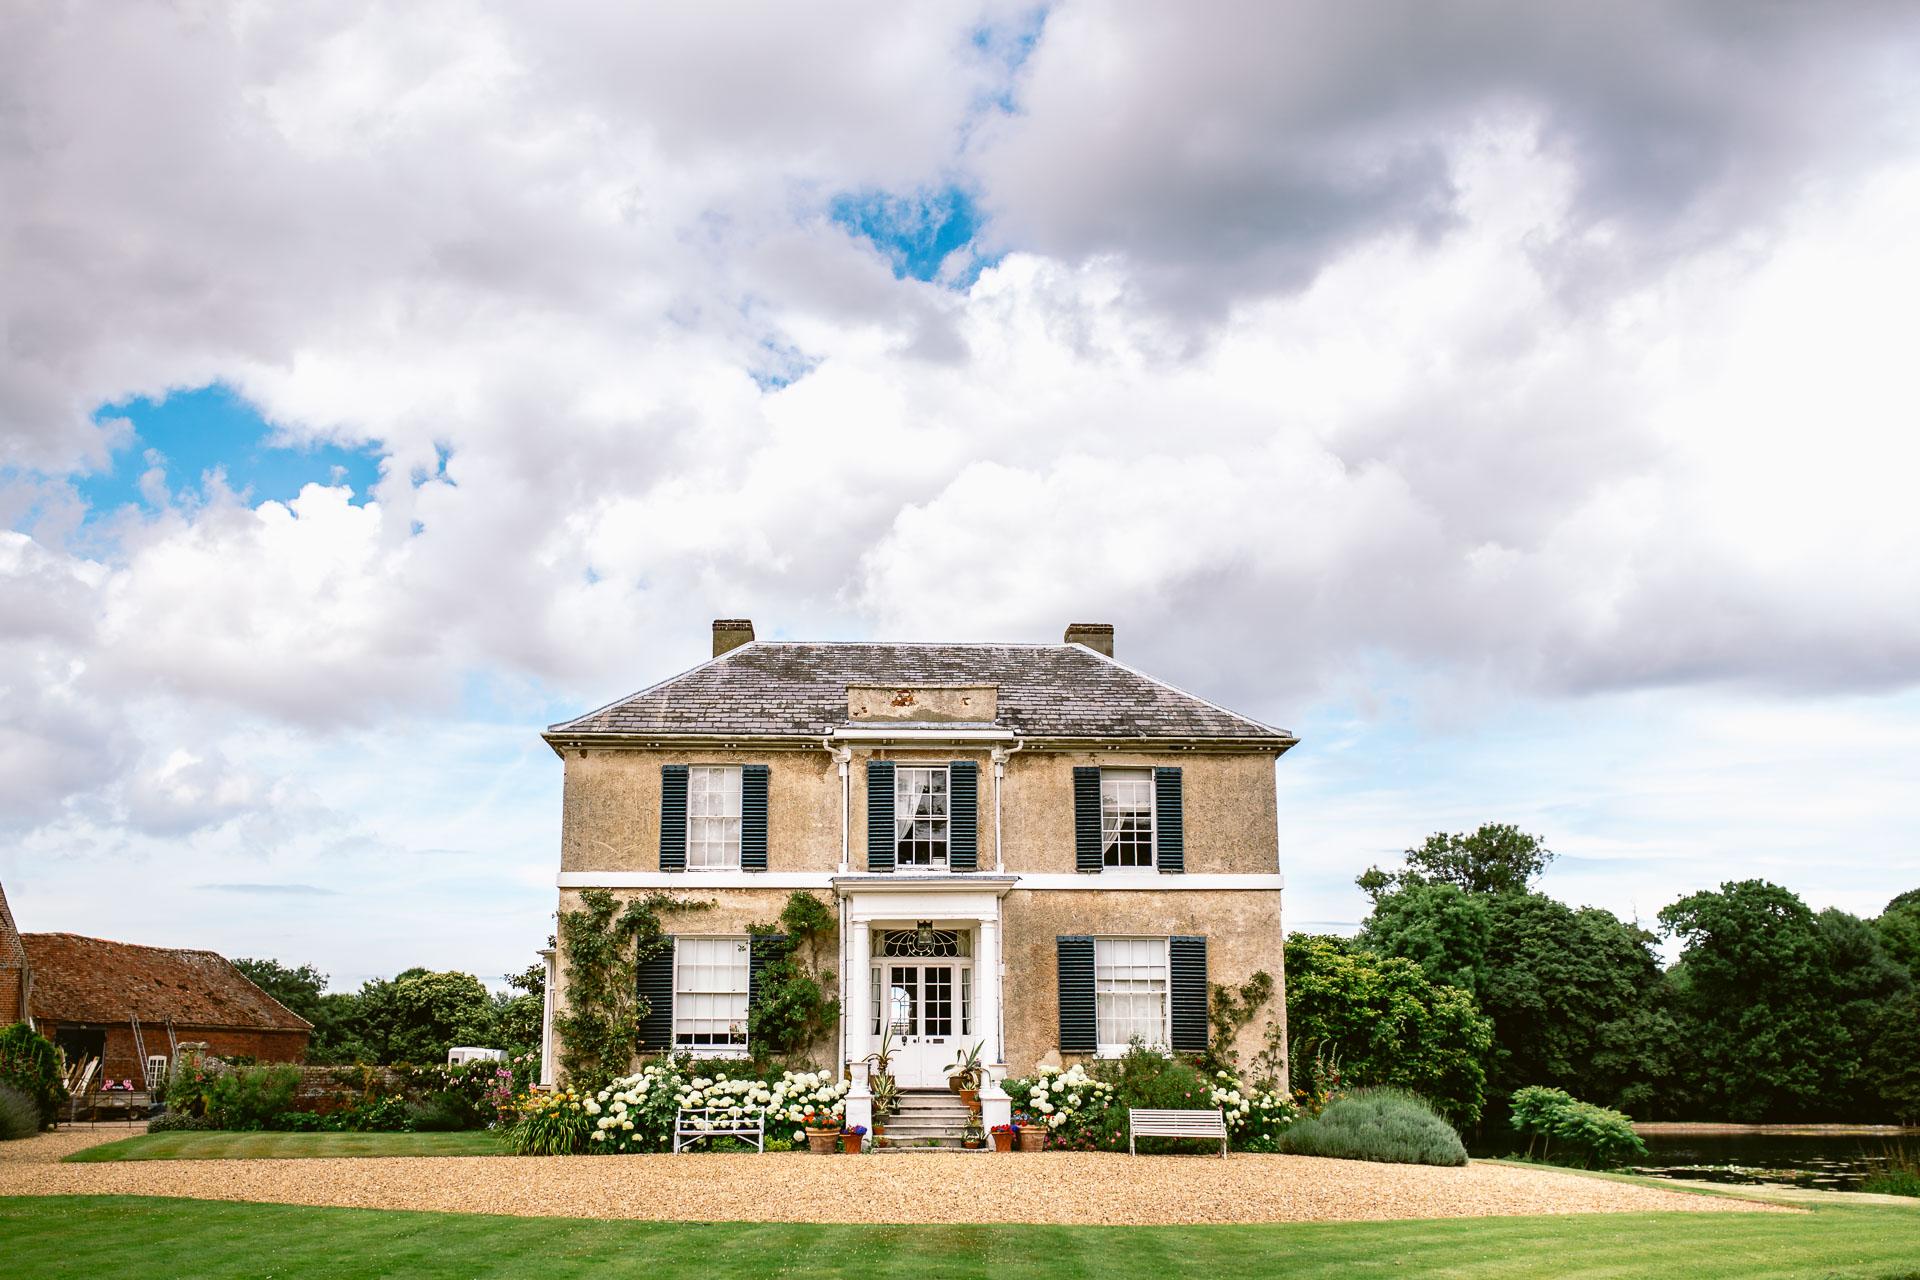 preston court boho wedding alexia and dan wedding venue front house in beautiful sunny day